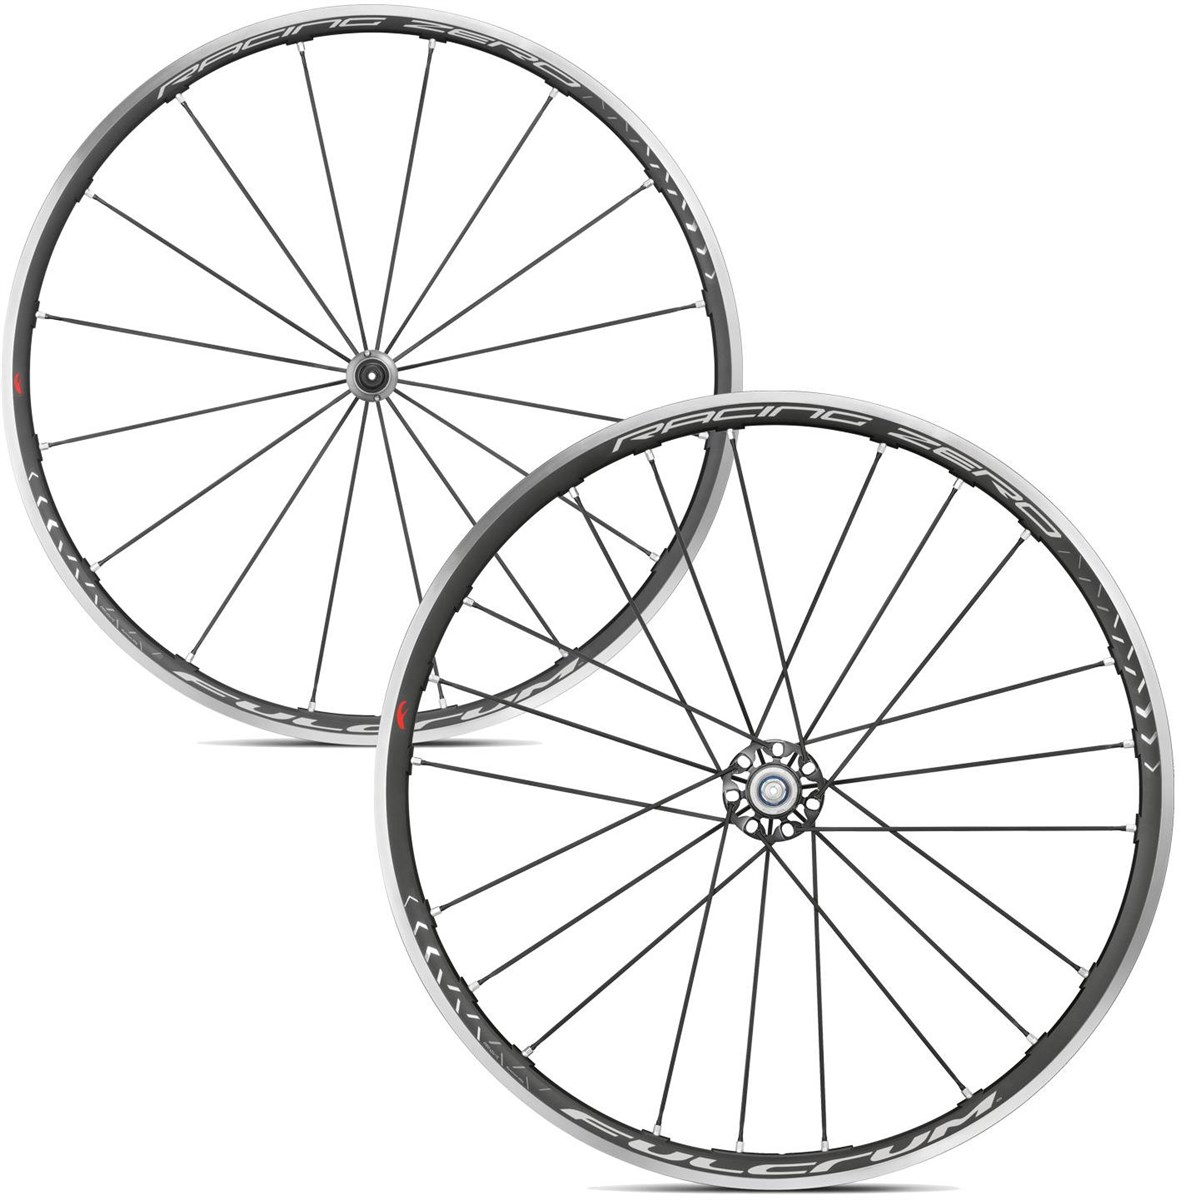 Fulcrum Racing Zero C17 Clincher Road Wheelset | Hjulsæt